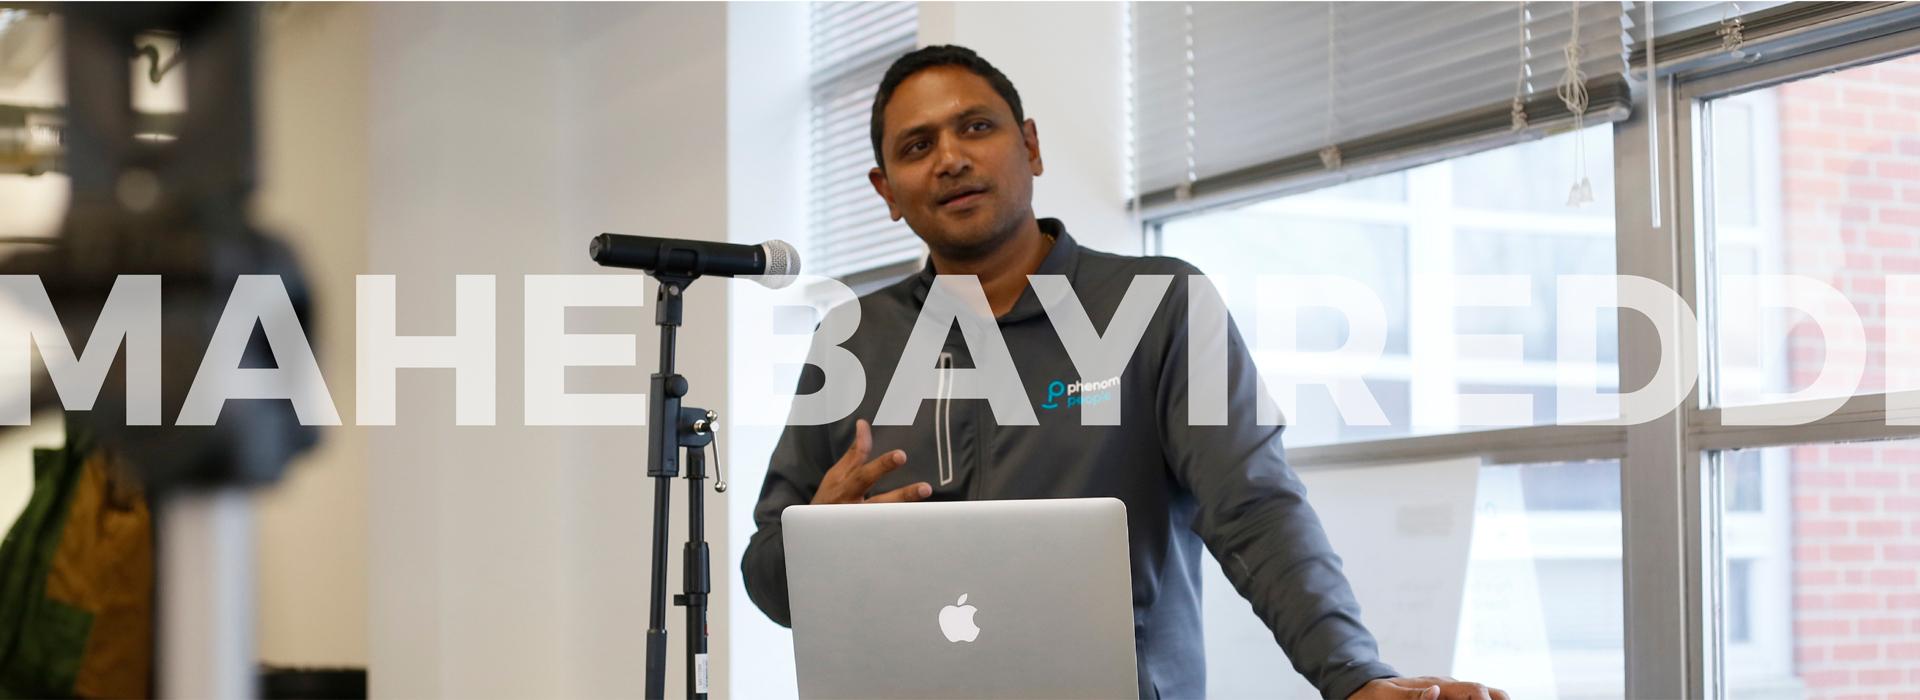 CEO, Mahe bayireddi giving speech